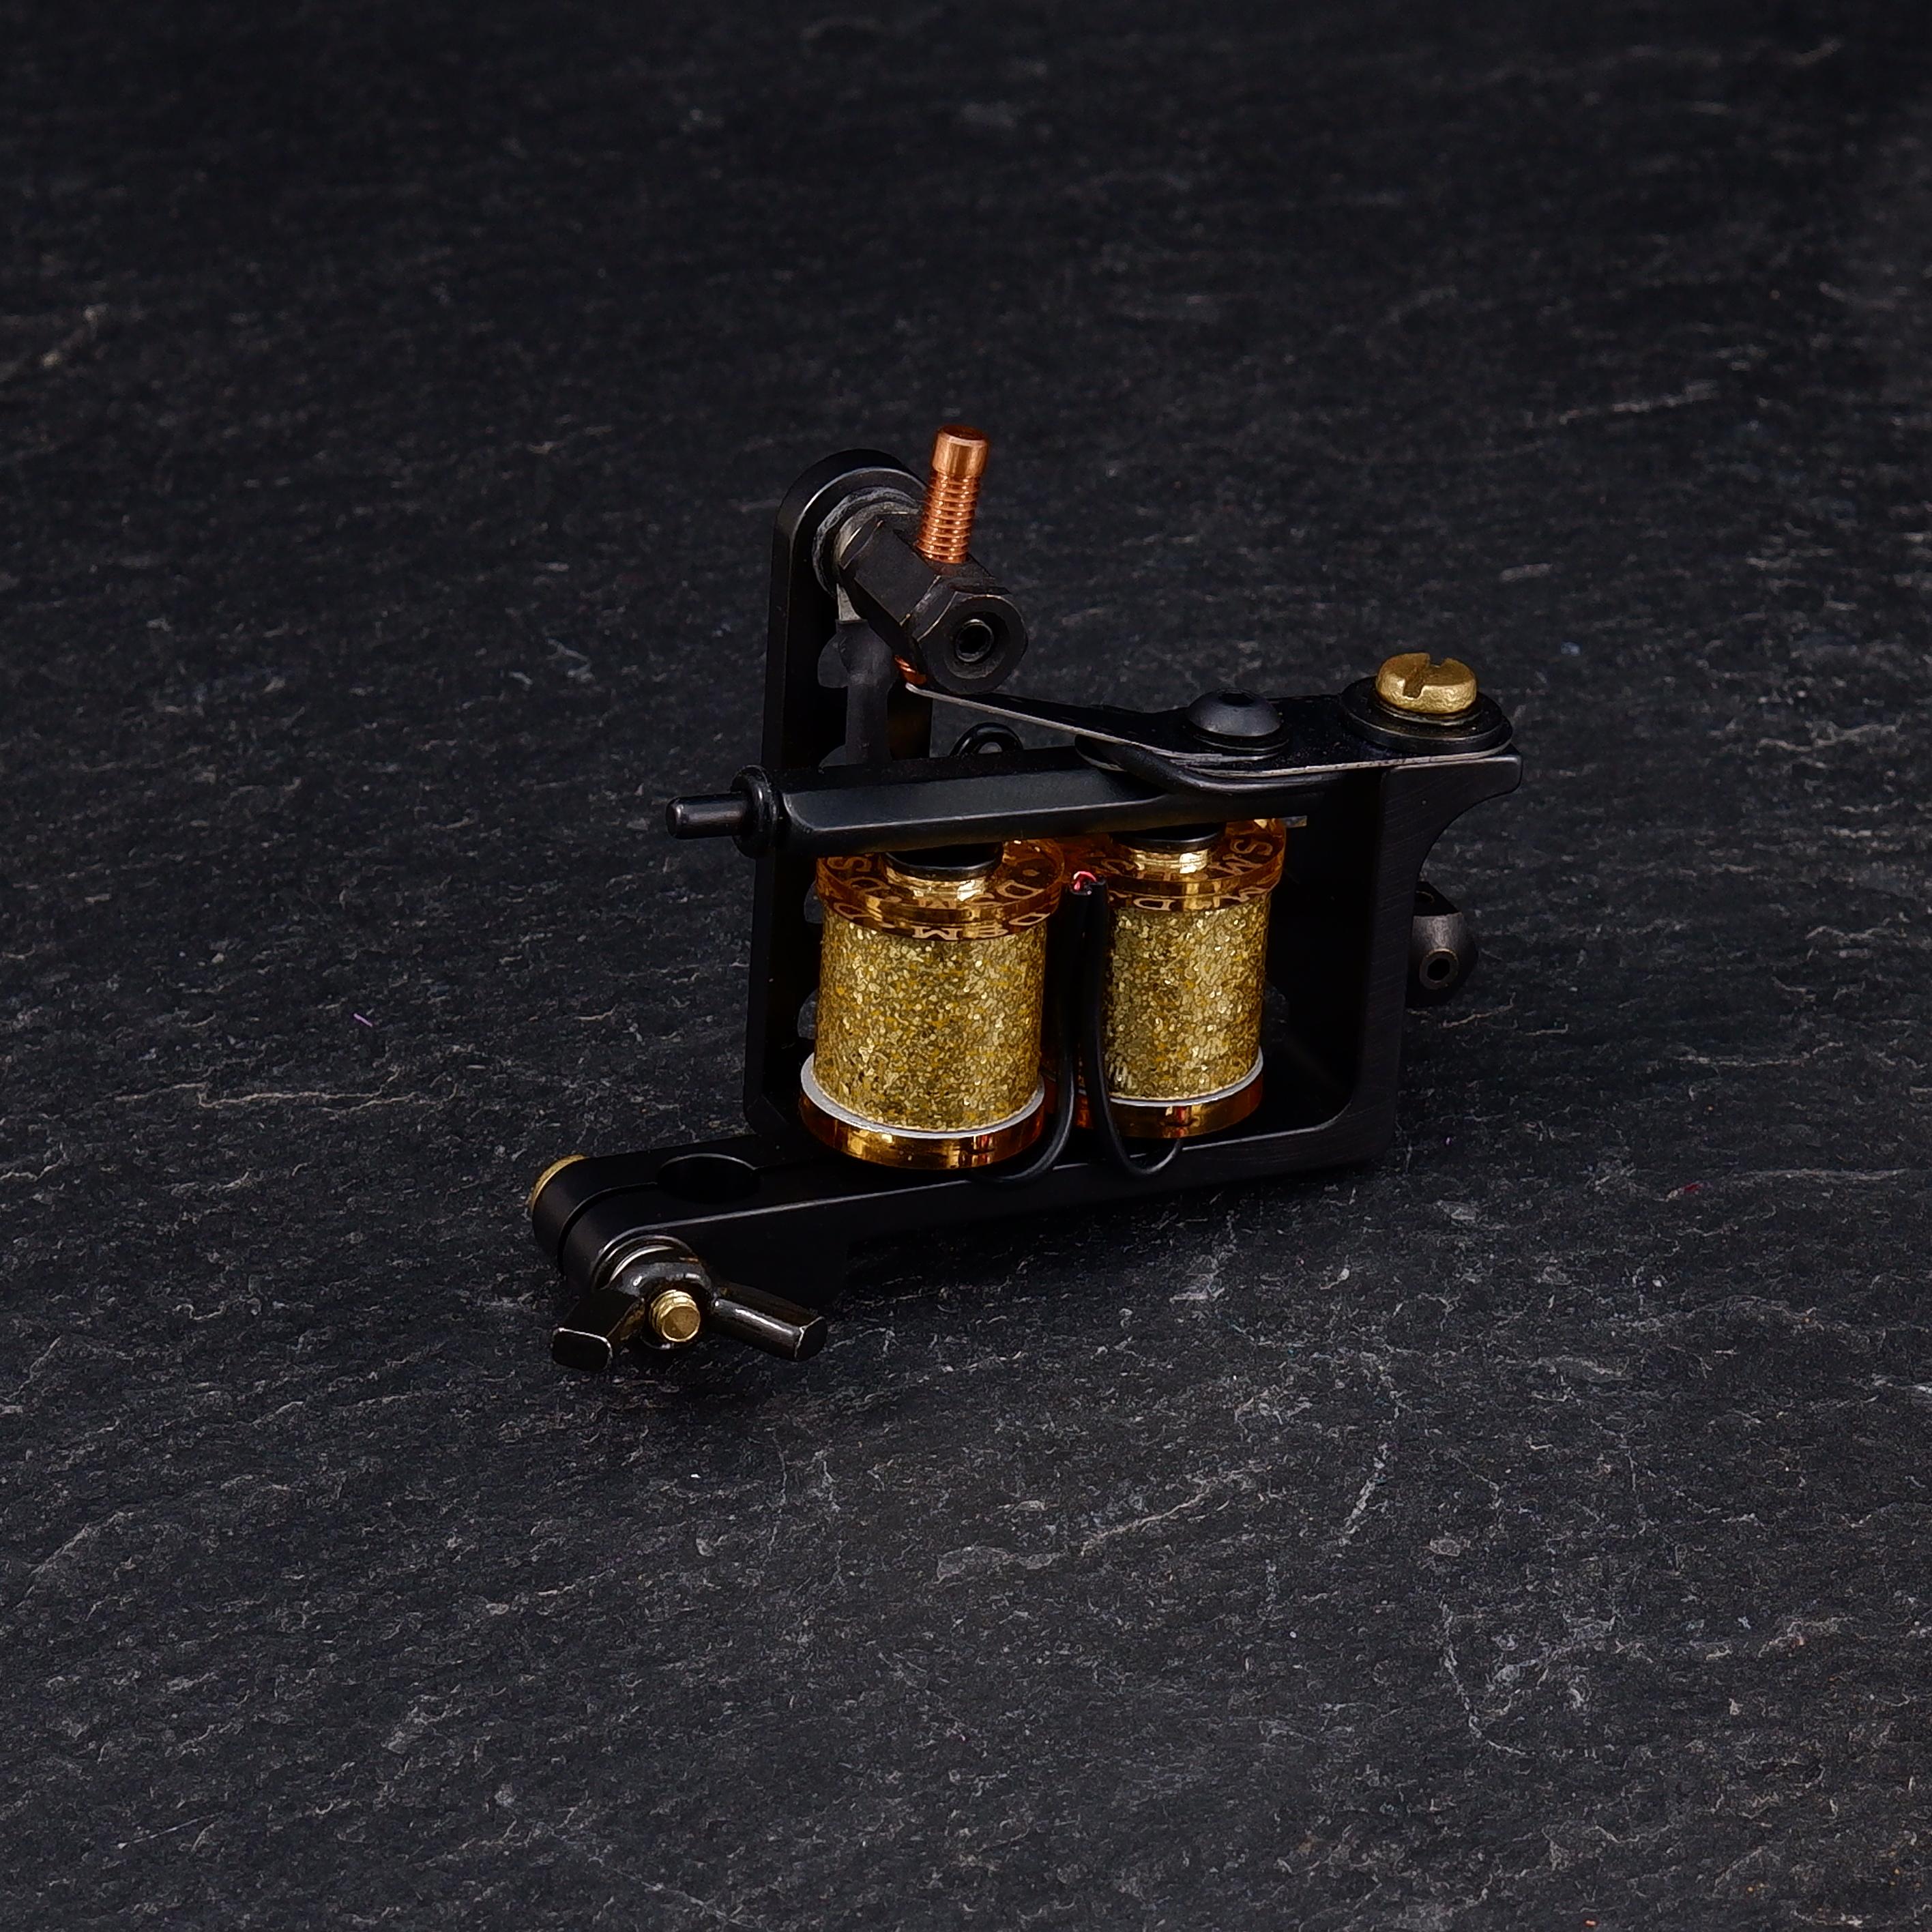 One-Off DanSelfMade Drilled Bulldog Power Liner Tattoo machine